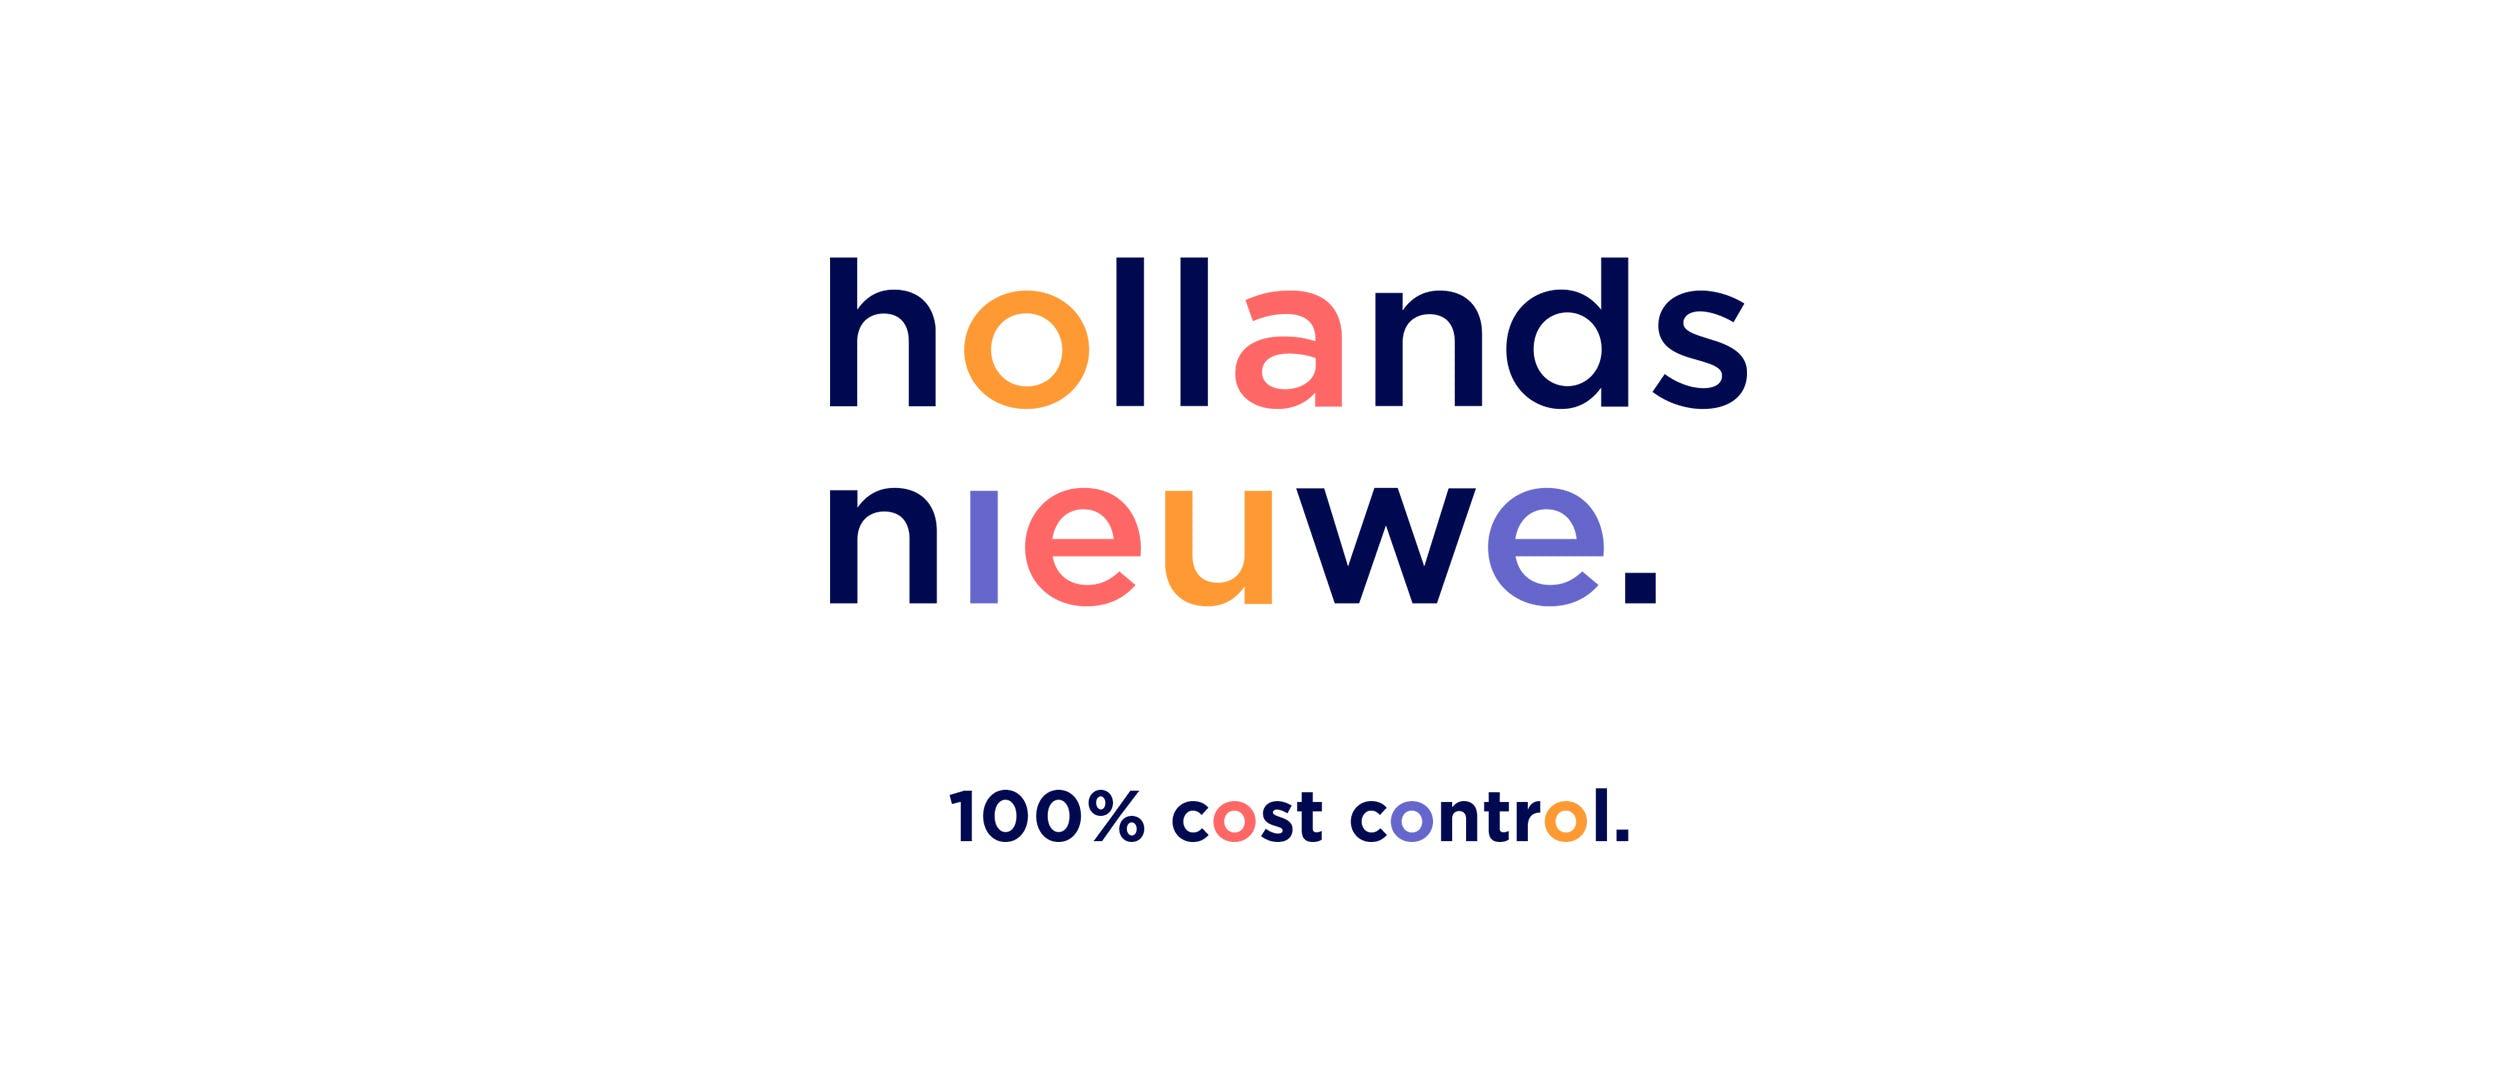 Vodafone The Netherlands: Chunk Creative Agency - Amsterdam | London